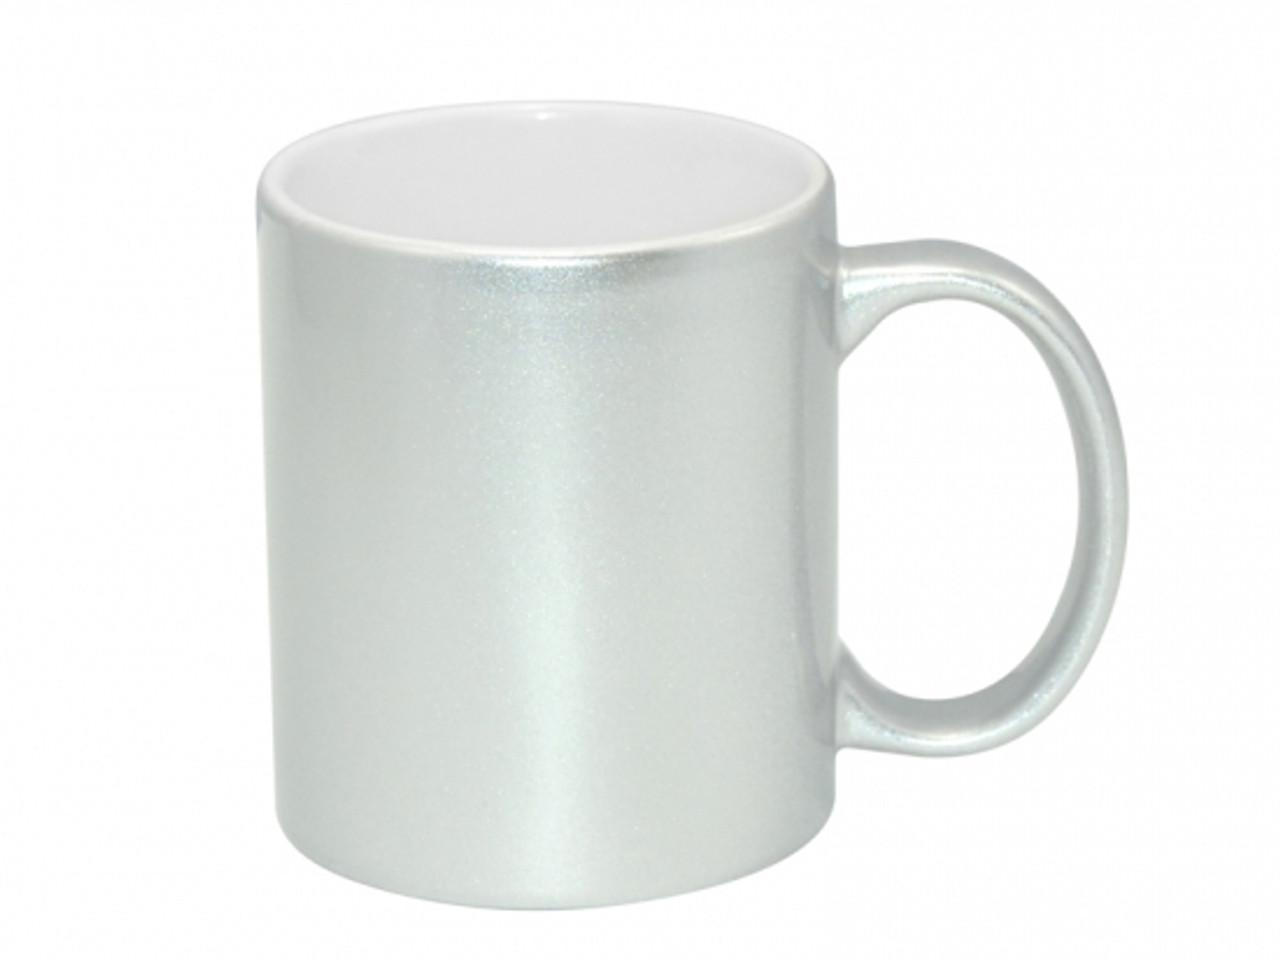 db5df6d3fc5 11oz Premium Metallic Silver Photo Mug for Sublimation - AAA Grade